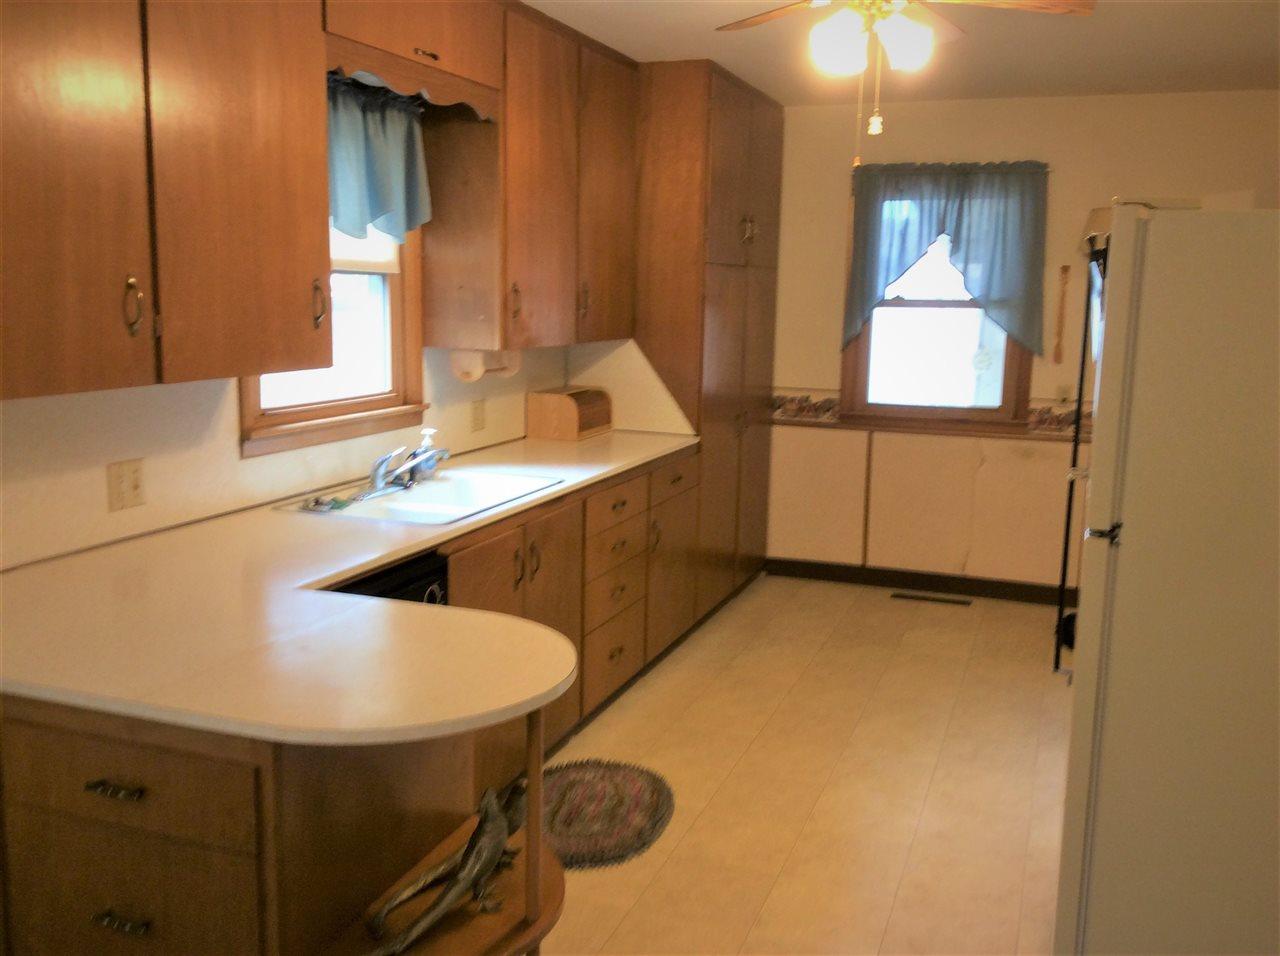 103 N SEDGWICK ST, HAVEN, KS 67543  Photo 2